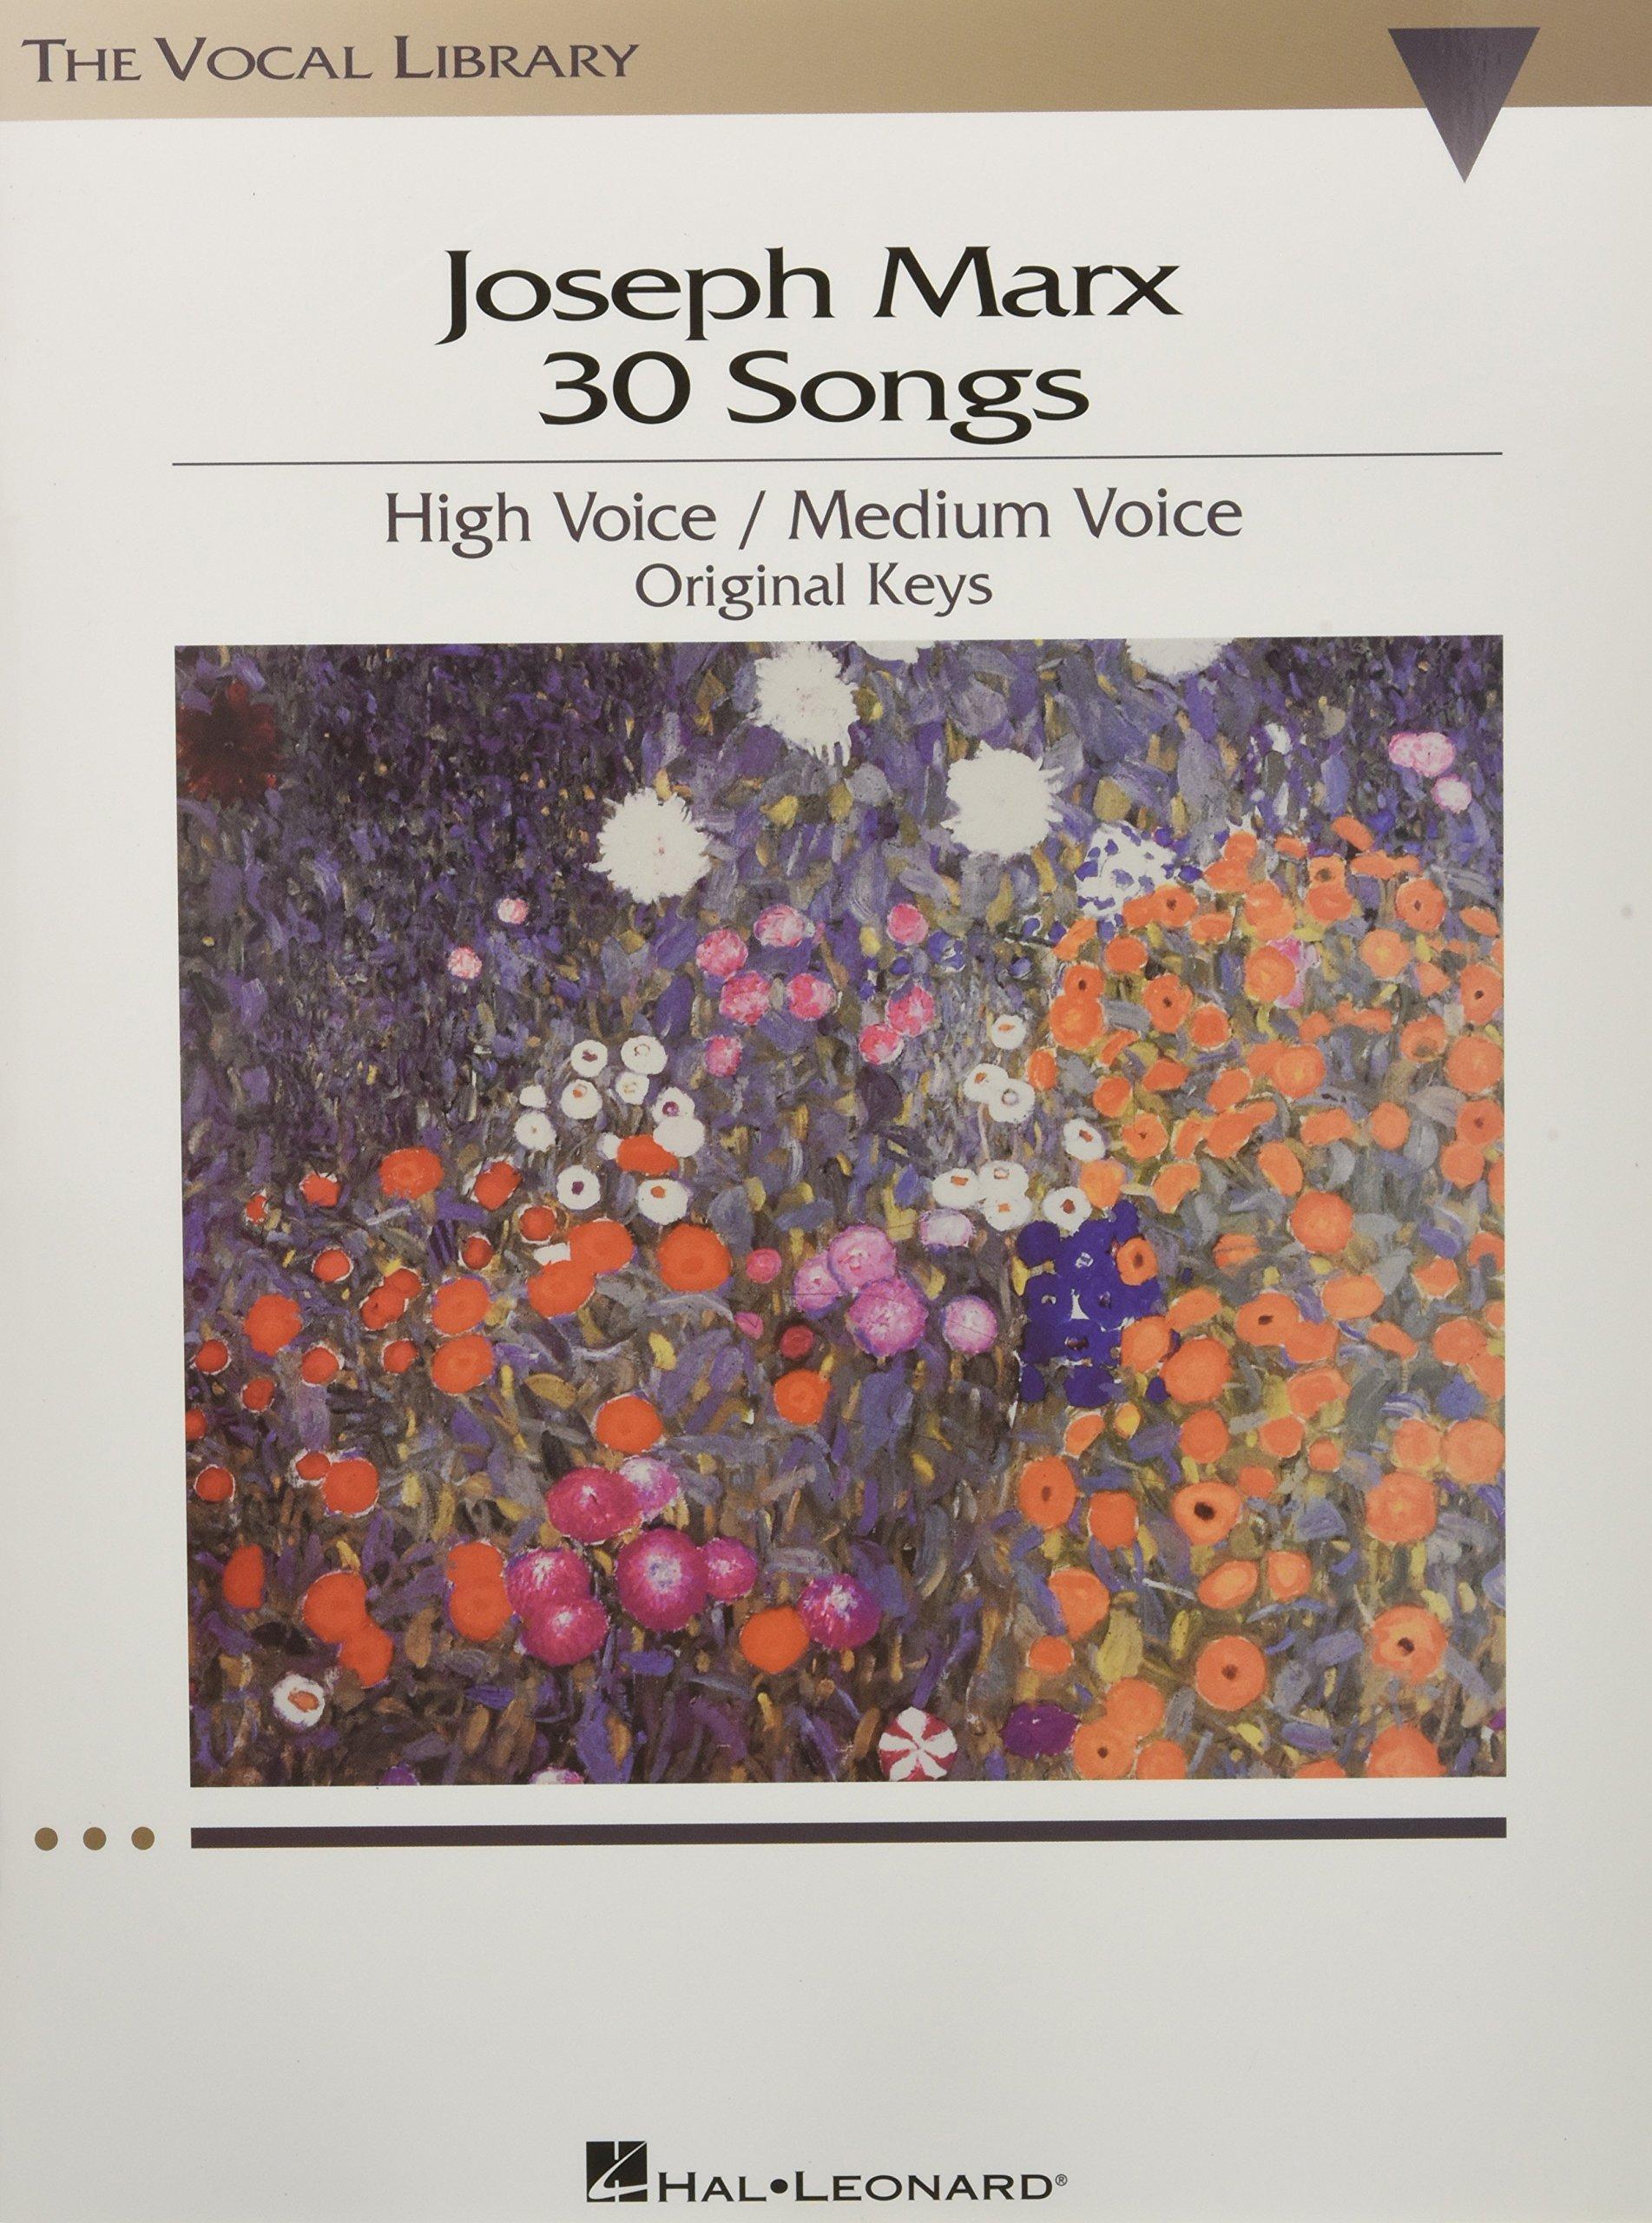 Joseph Marx - 30 Songs: Original Keys for High Voice/Medium Voice The Vocal  Library: Joseph Marx: 9781423405665: Amazon.com: Books